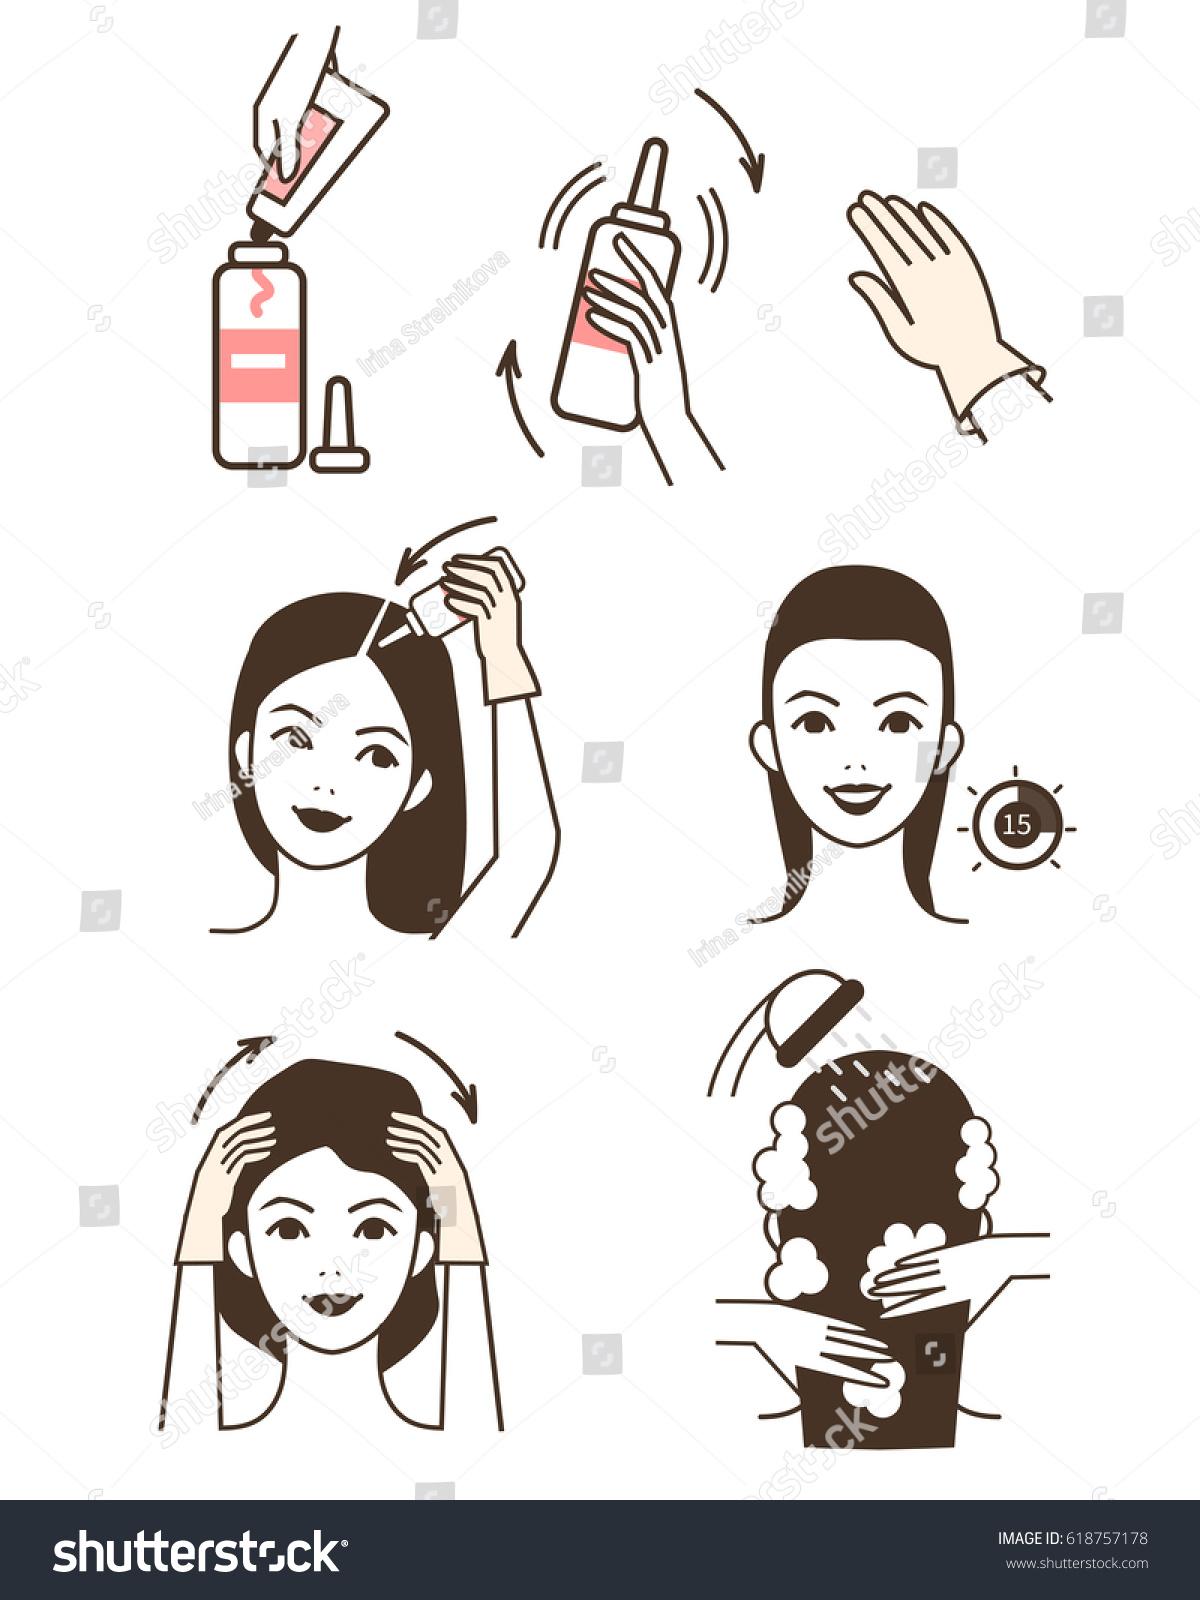 Steps How Apply Hair Dye Vector Stock Vector (Royalty Free ...